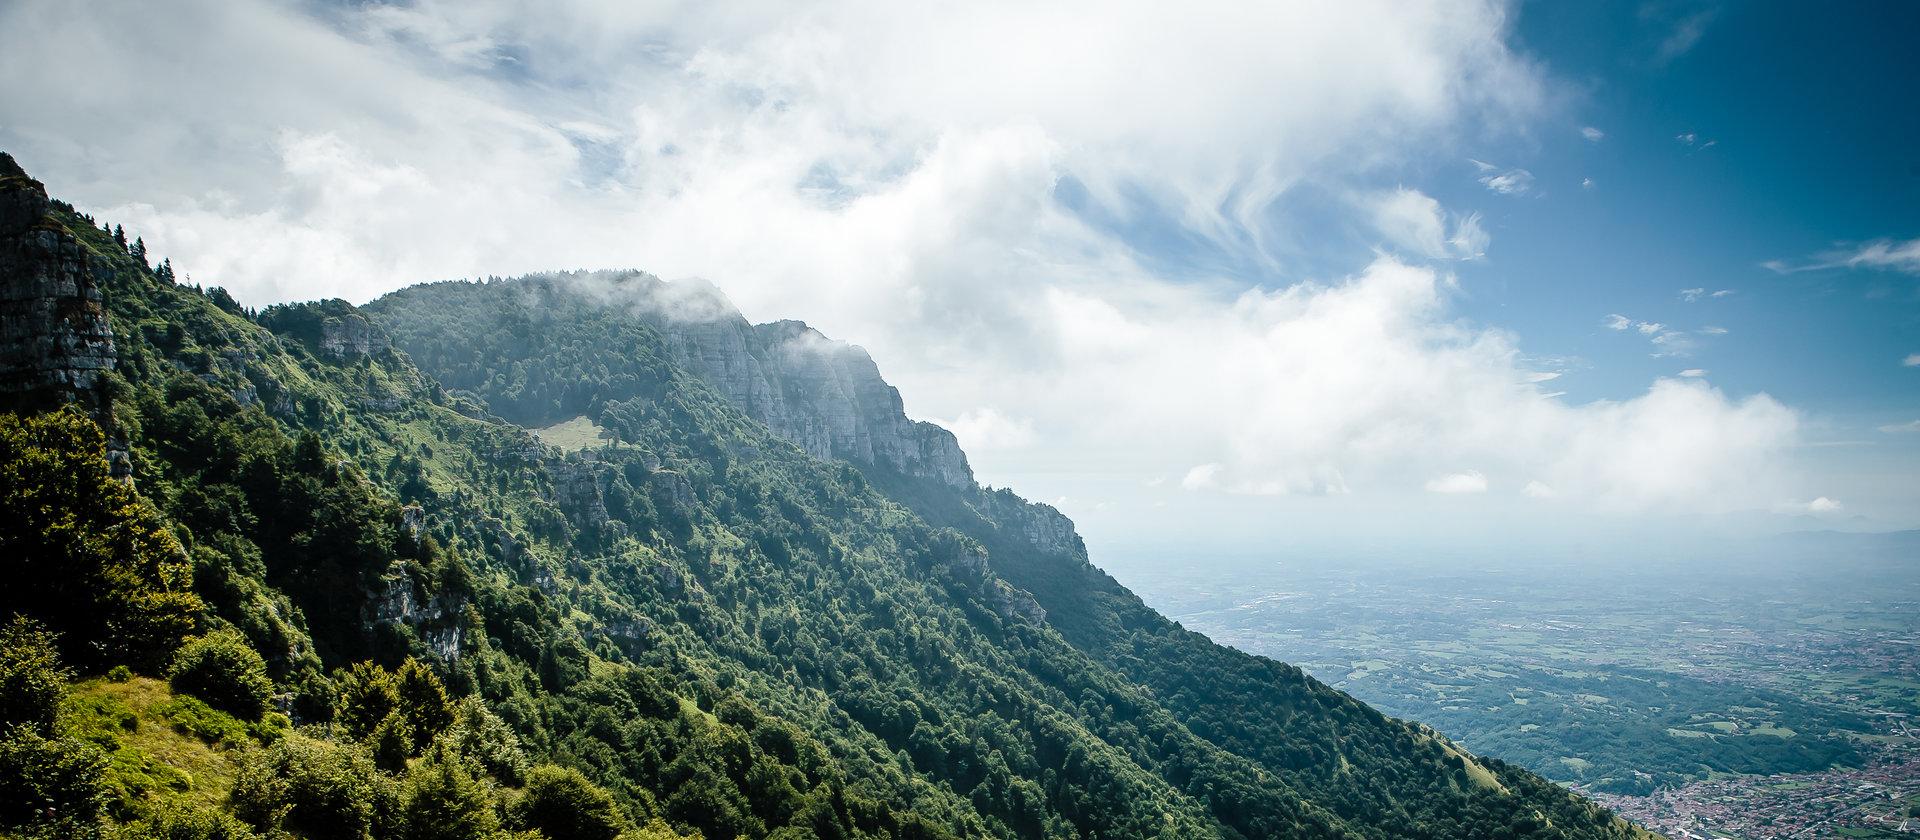 montagna altopiano di asiago